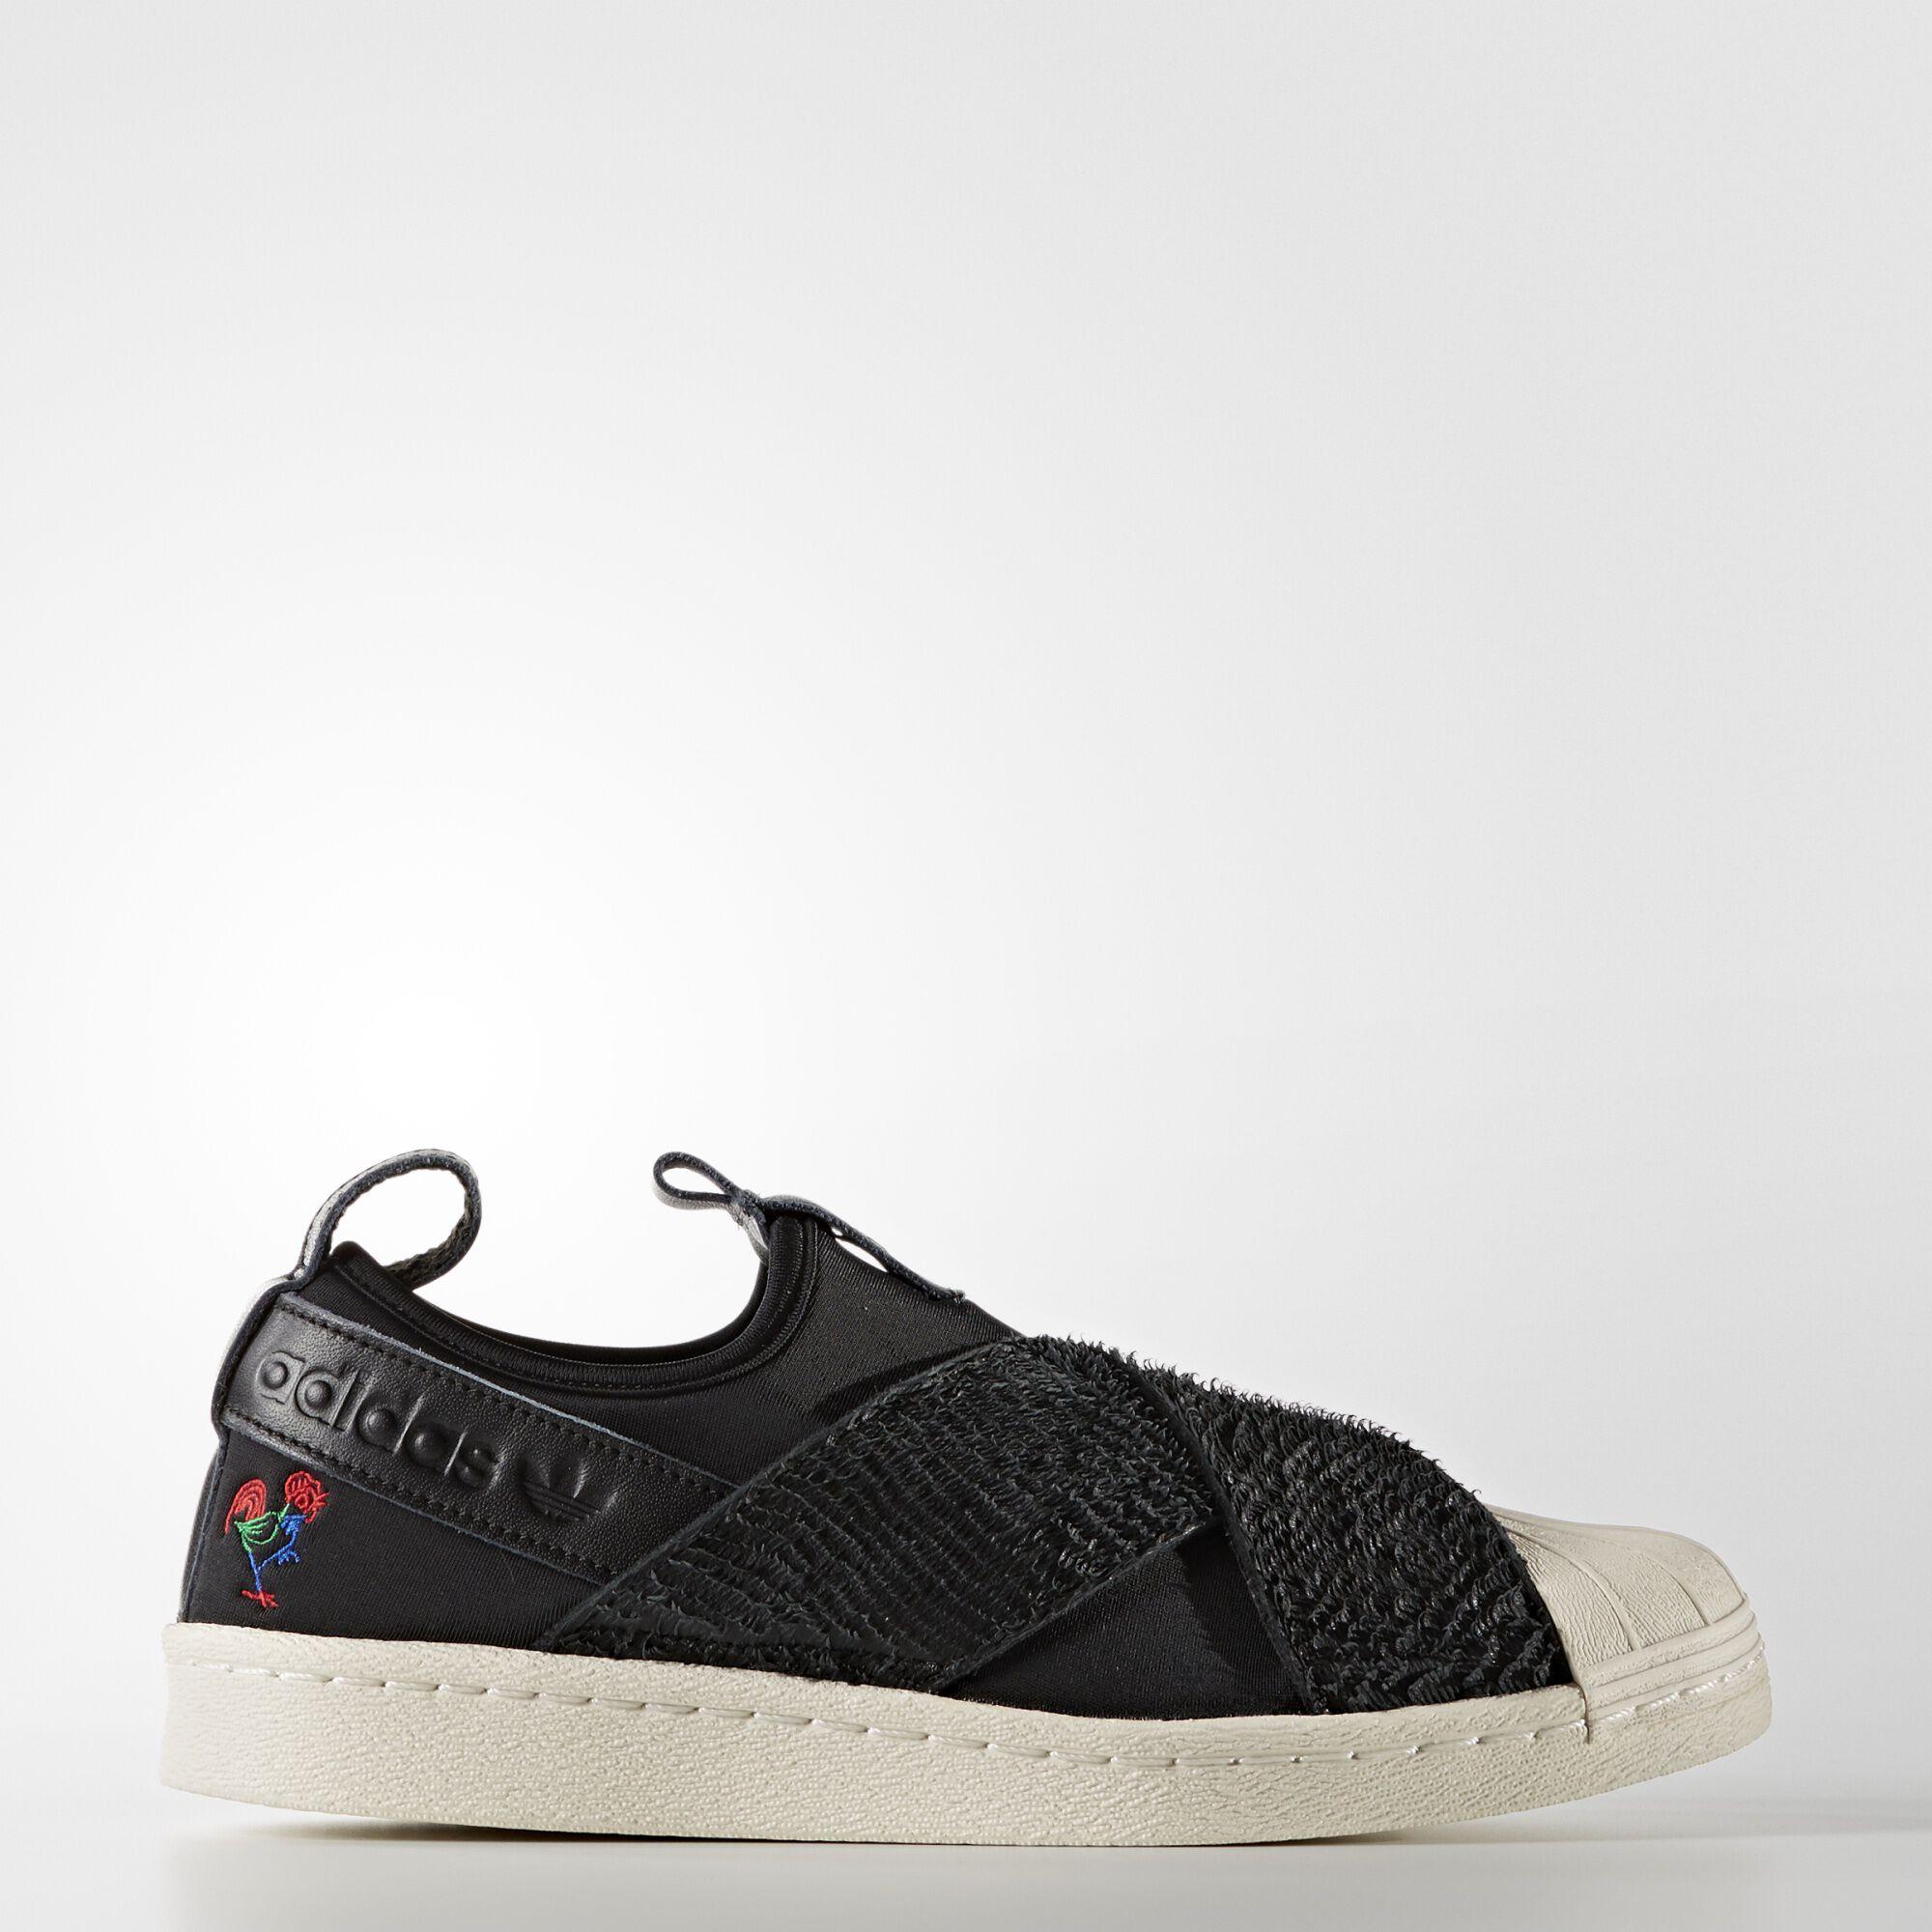 adidas for women on sale,black adidas bag > OFF75% Free